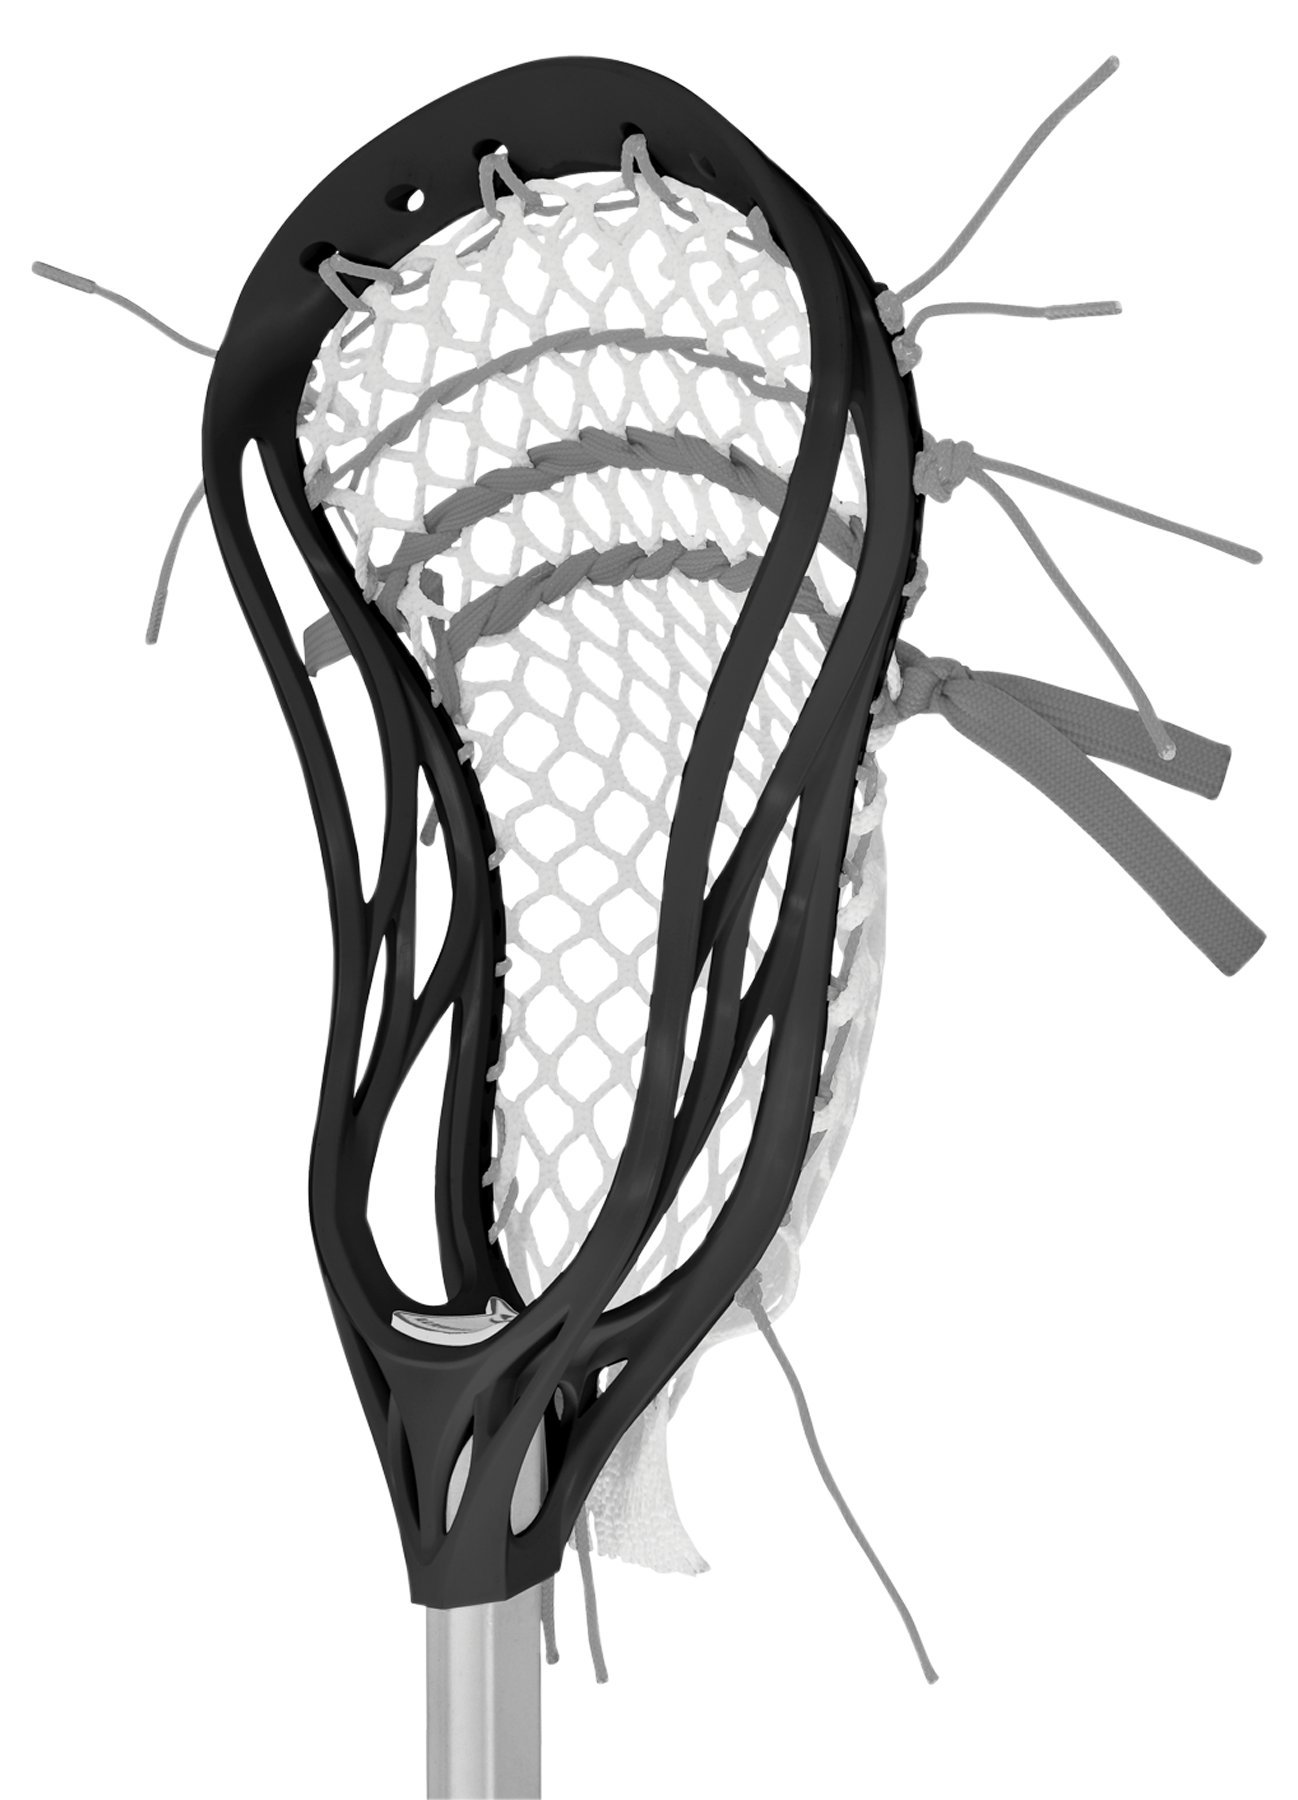 Warrior Evo 4 X Strung Head Lacrose Stick, Black